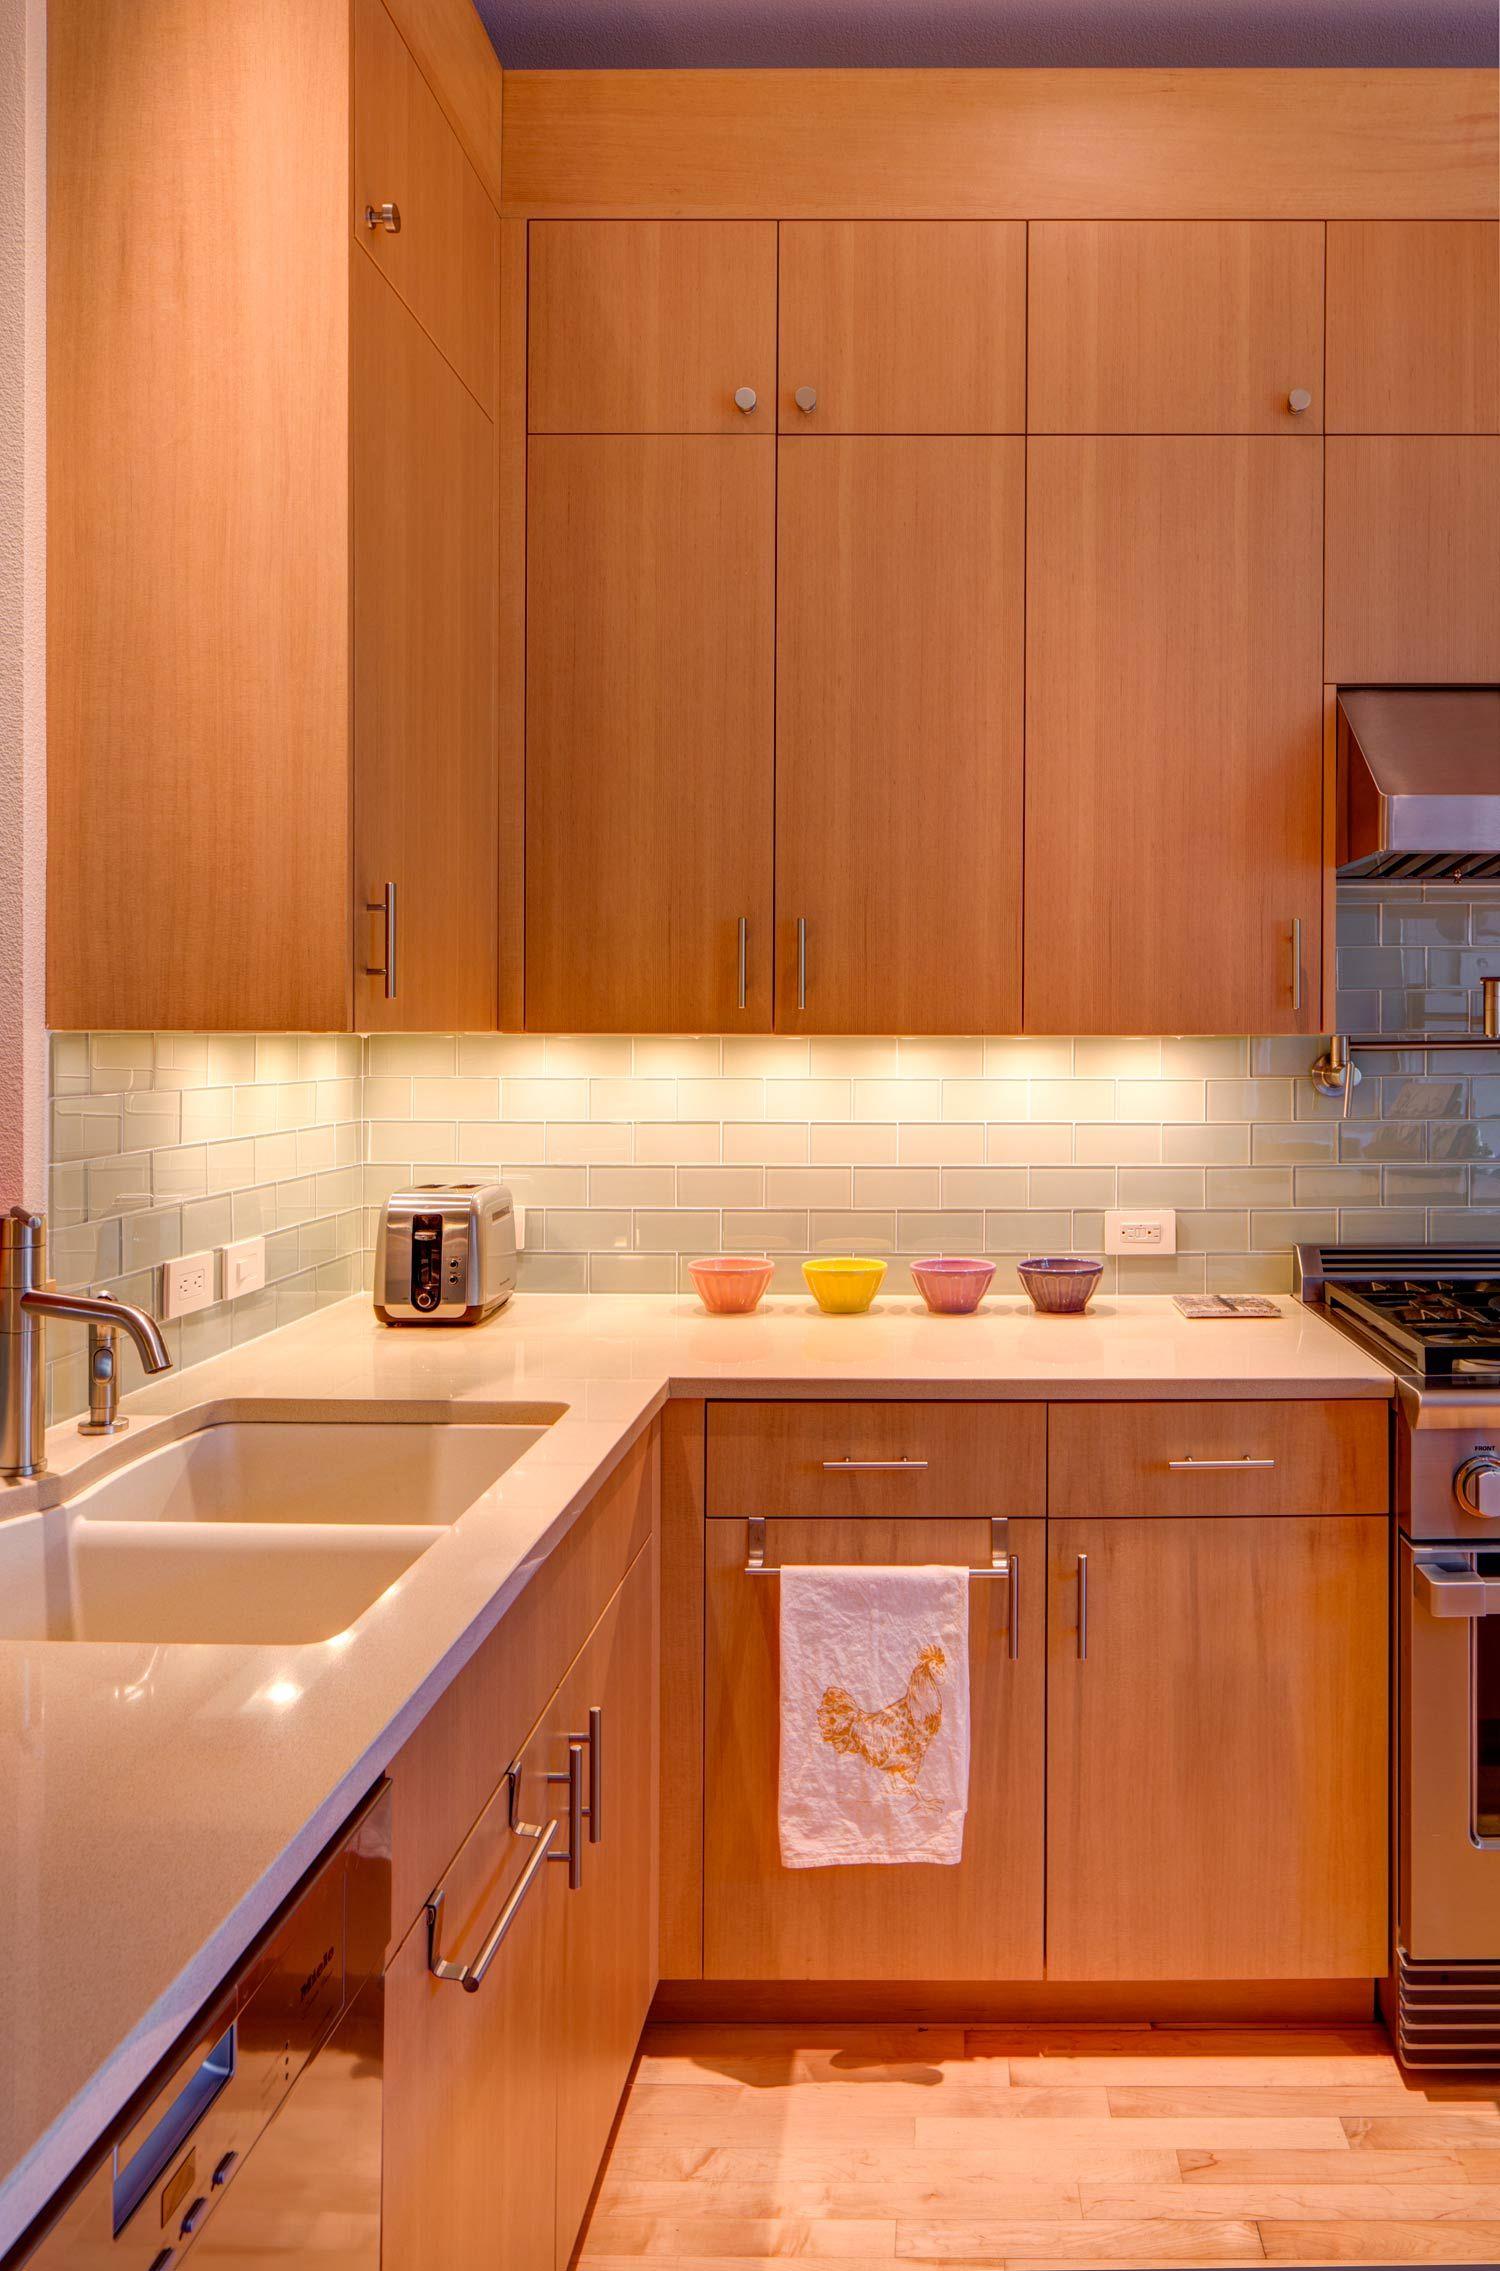 Unique Vertical Grain Fir Kitchen Cabinets Kitchen Cabinets In Sizing 800 X 1196 Kitchen Cabinets Cabinet Kitchen